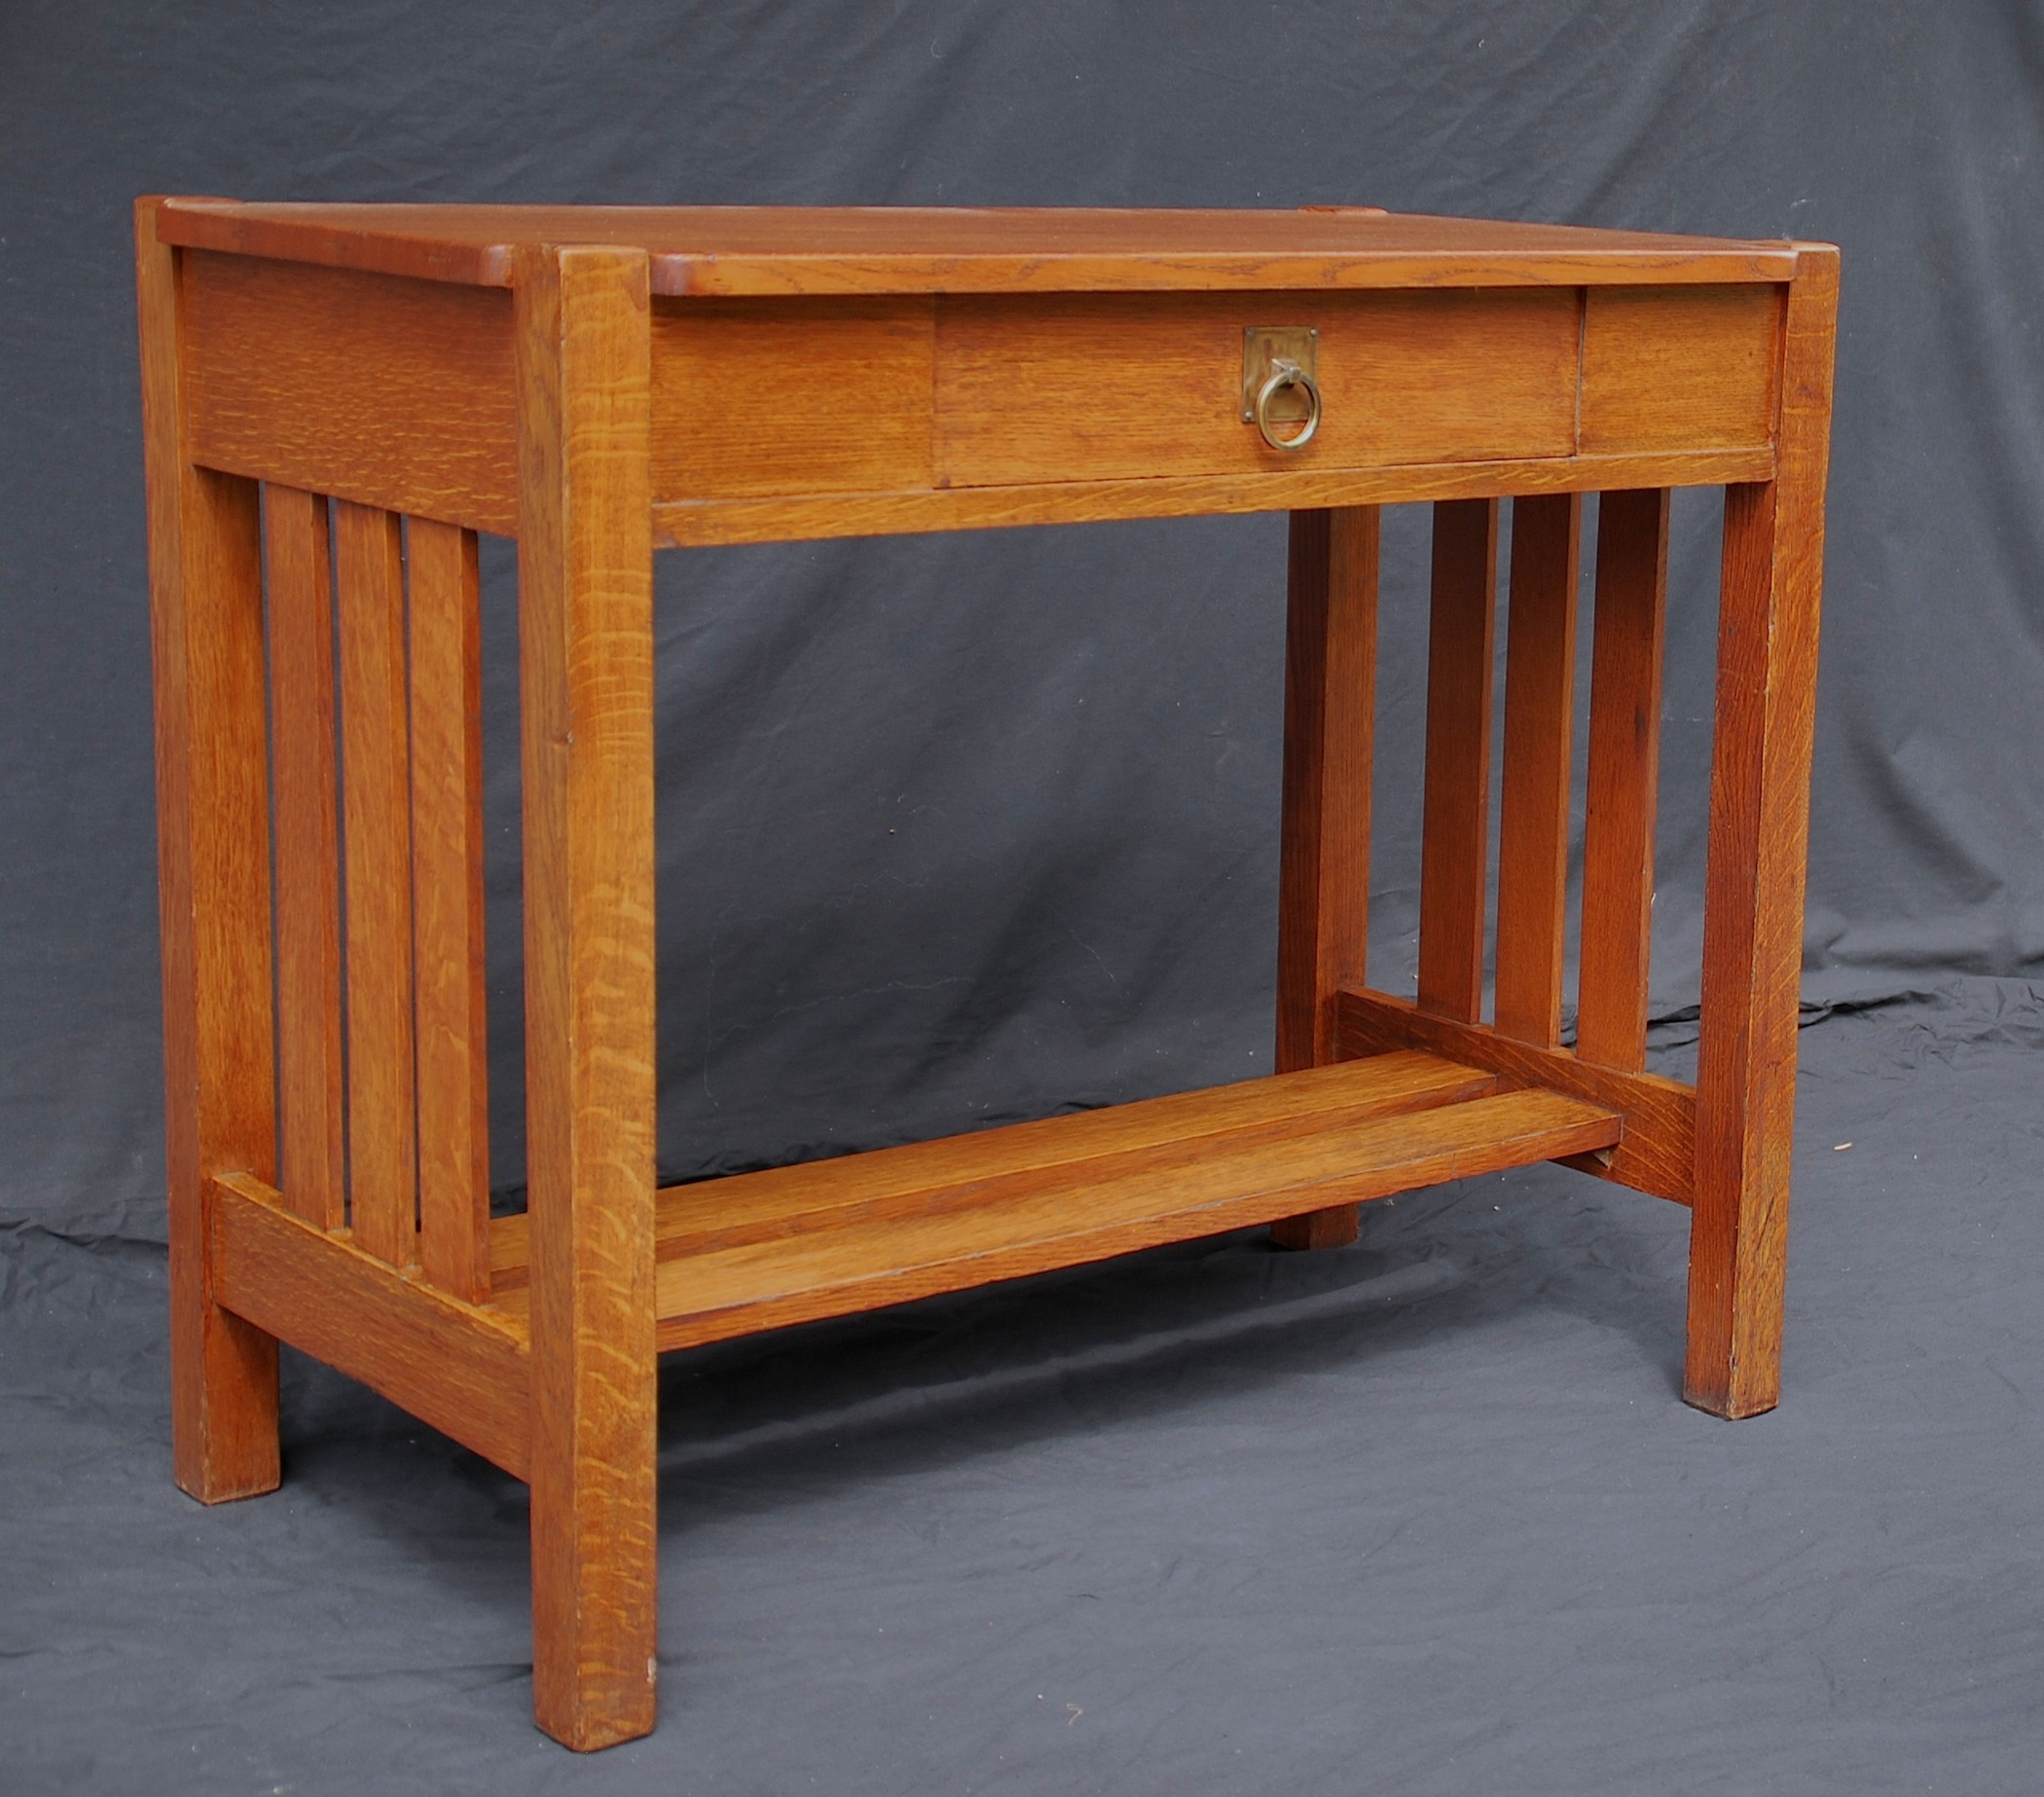 voorhees craftsman mission oak furniture stickley brothers small rh voorheescraftsman com